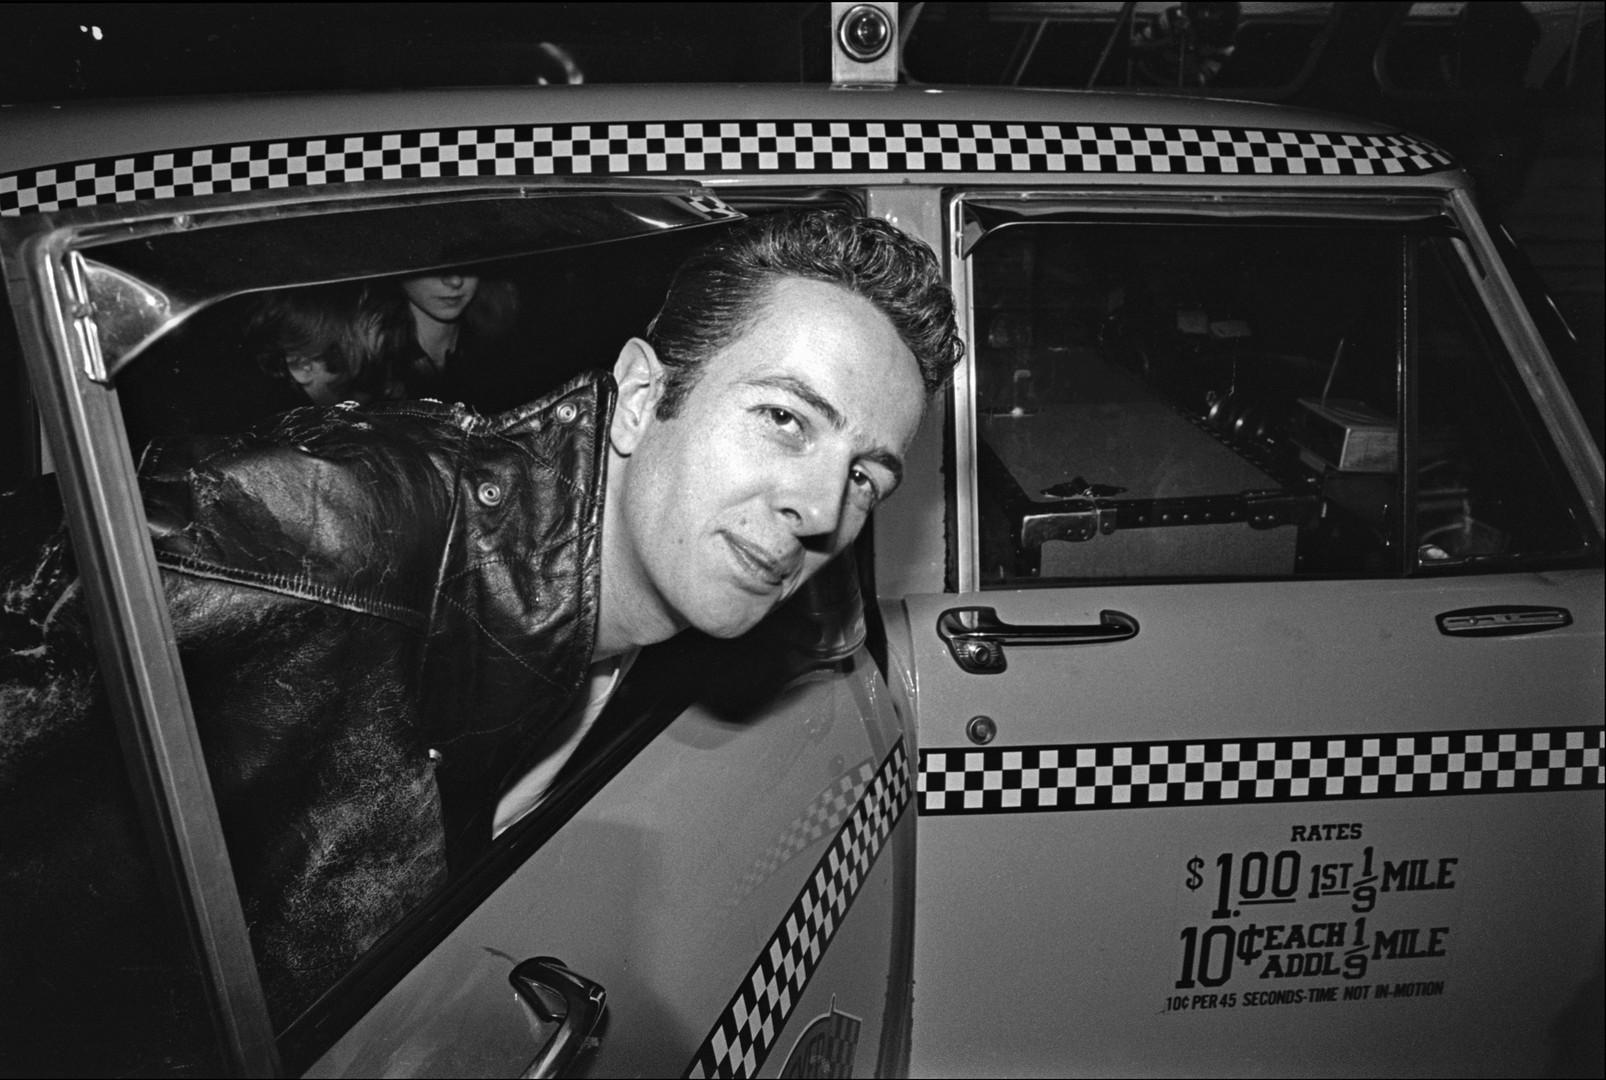 The Clash. Joe arrives in a Taxi